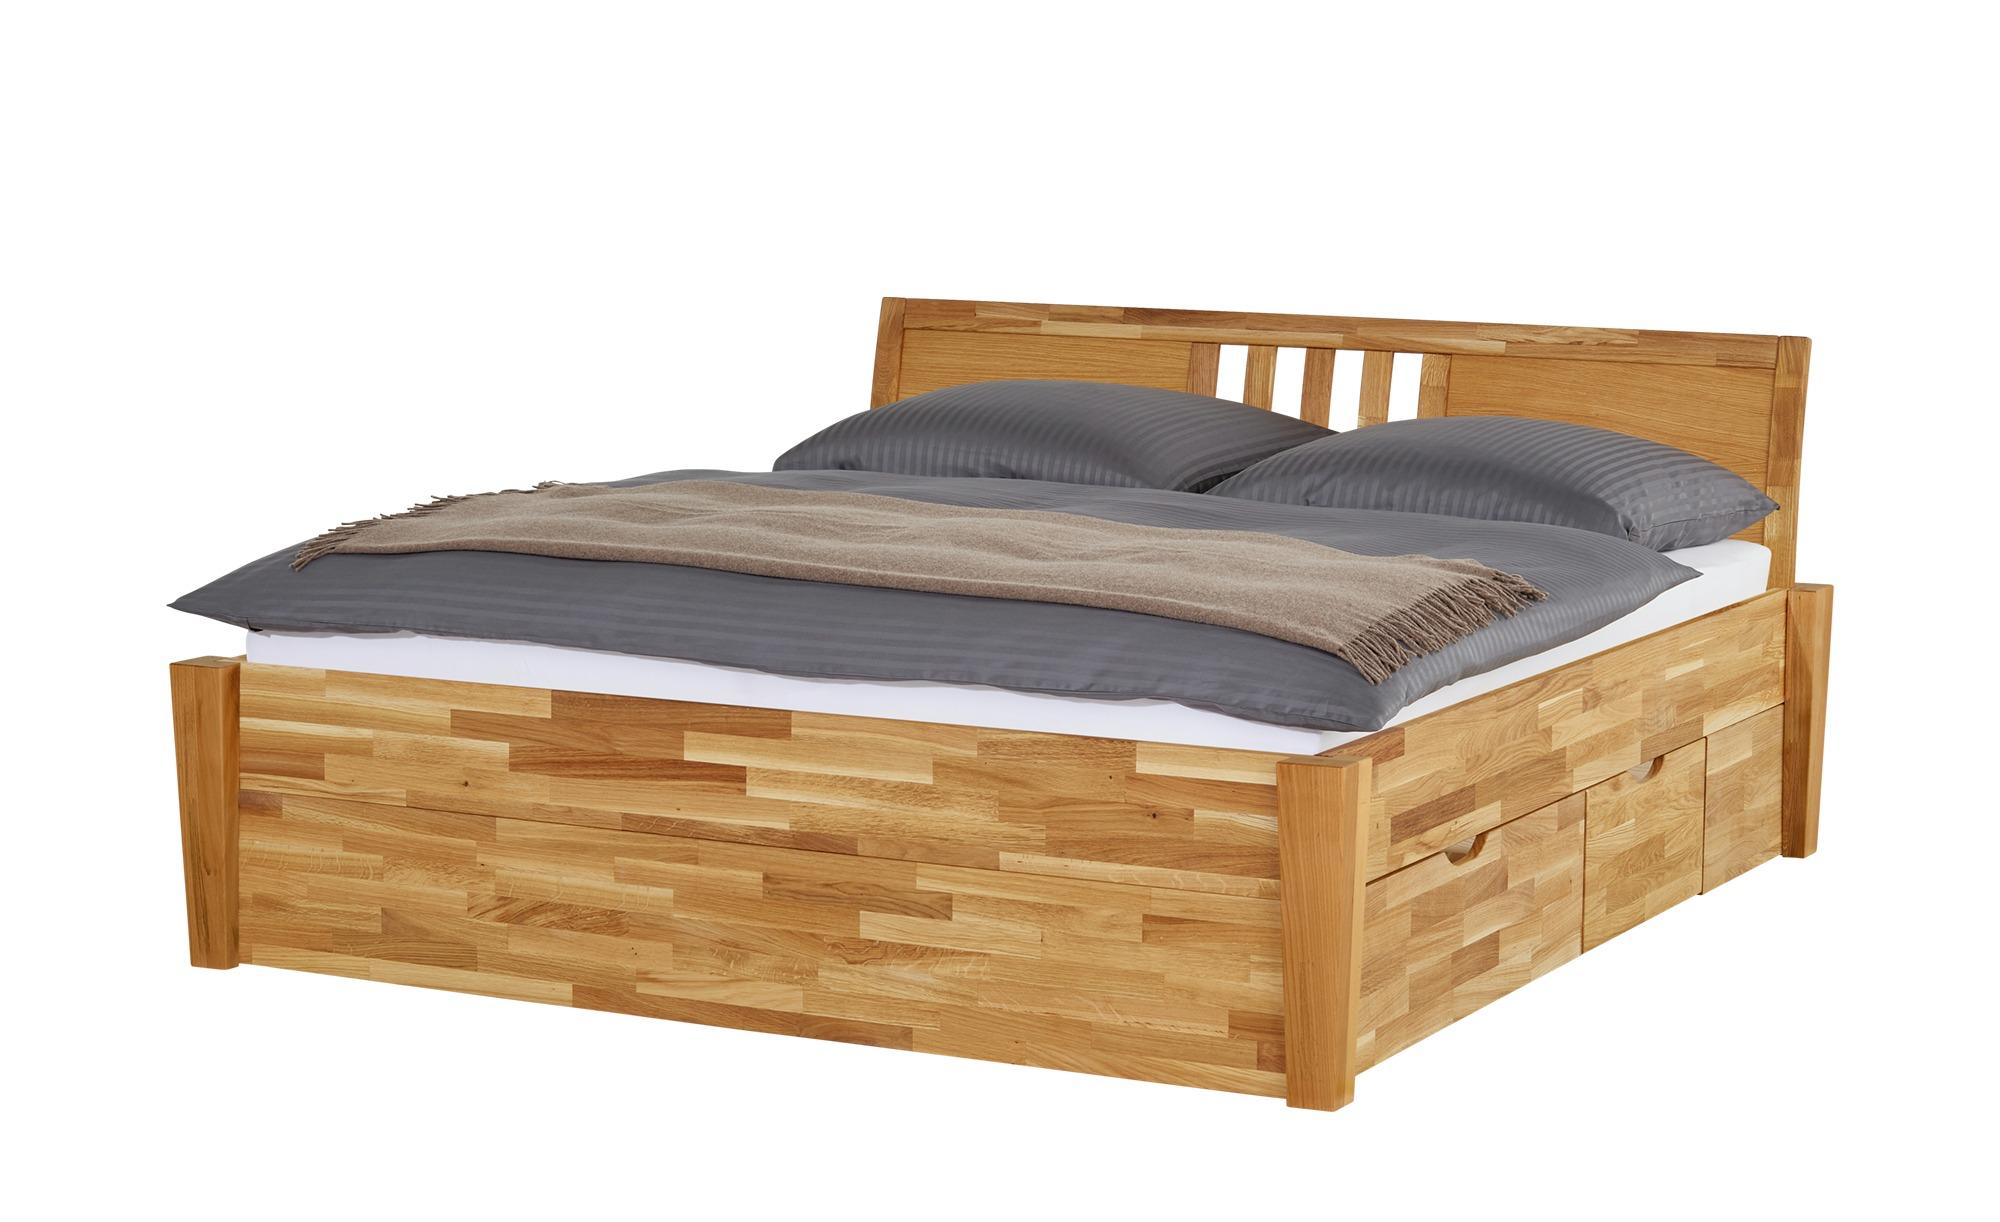 b15d73a6f9 Massivholz-Bettgestell mit Bettkasten Timber in 2019 | Products ...